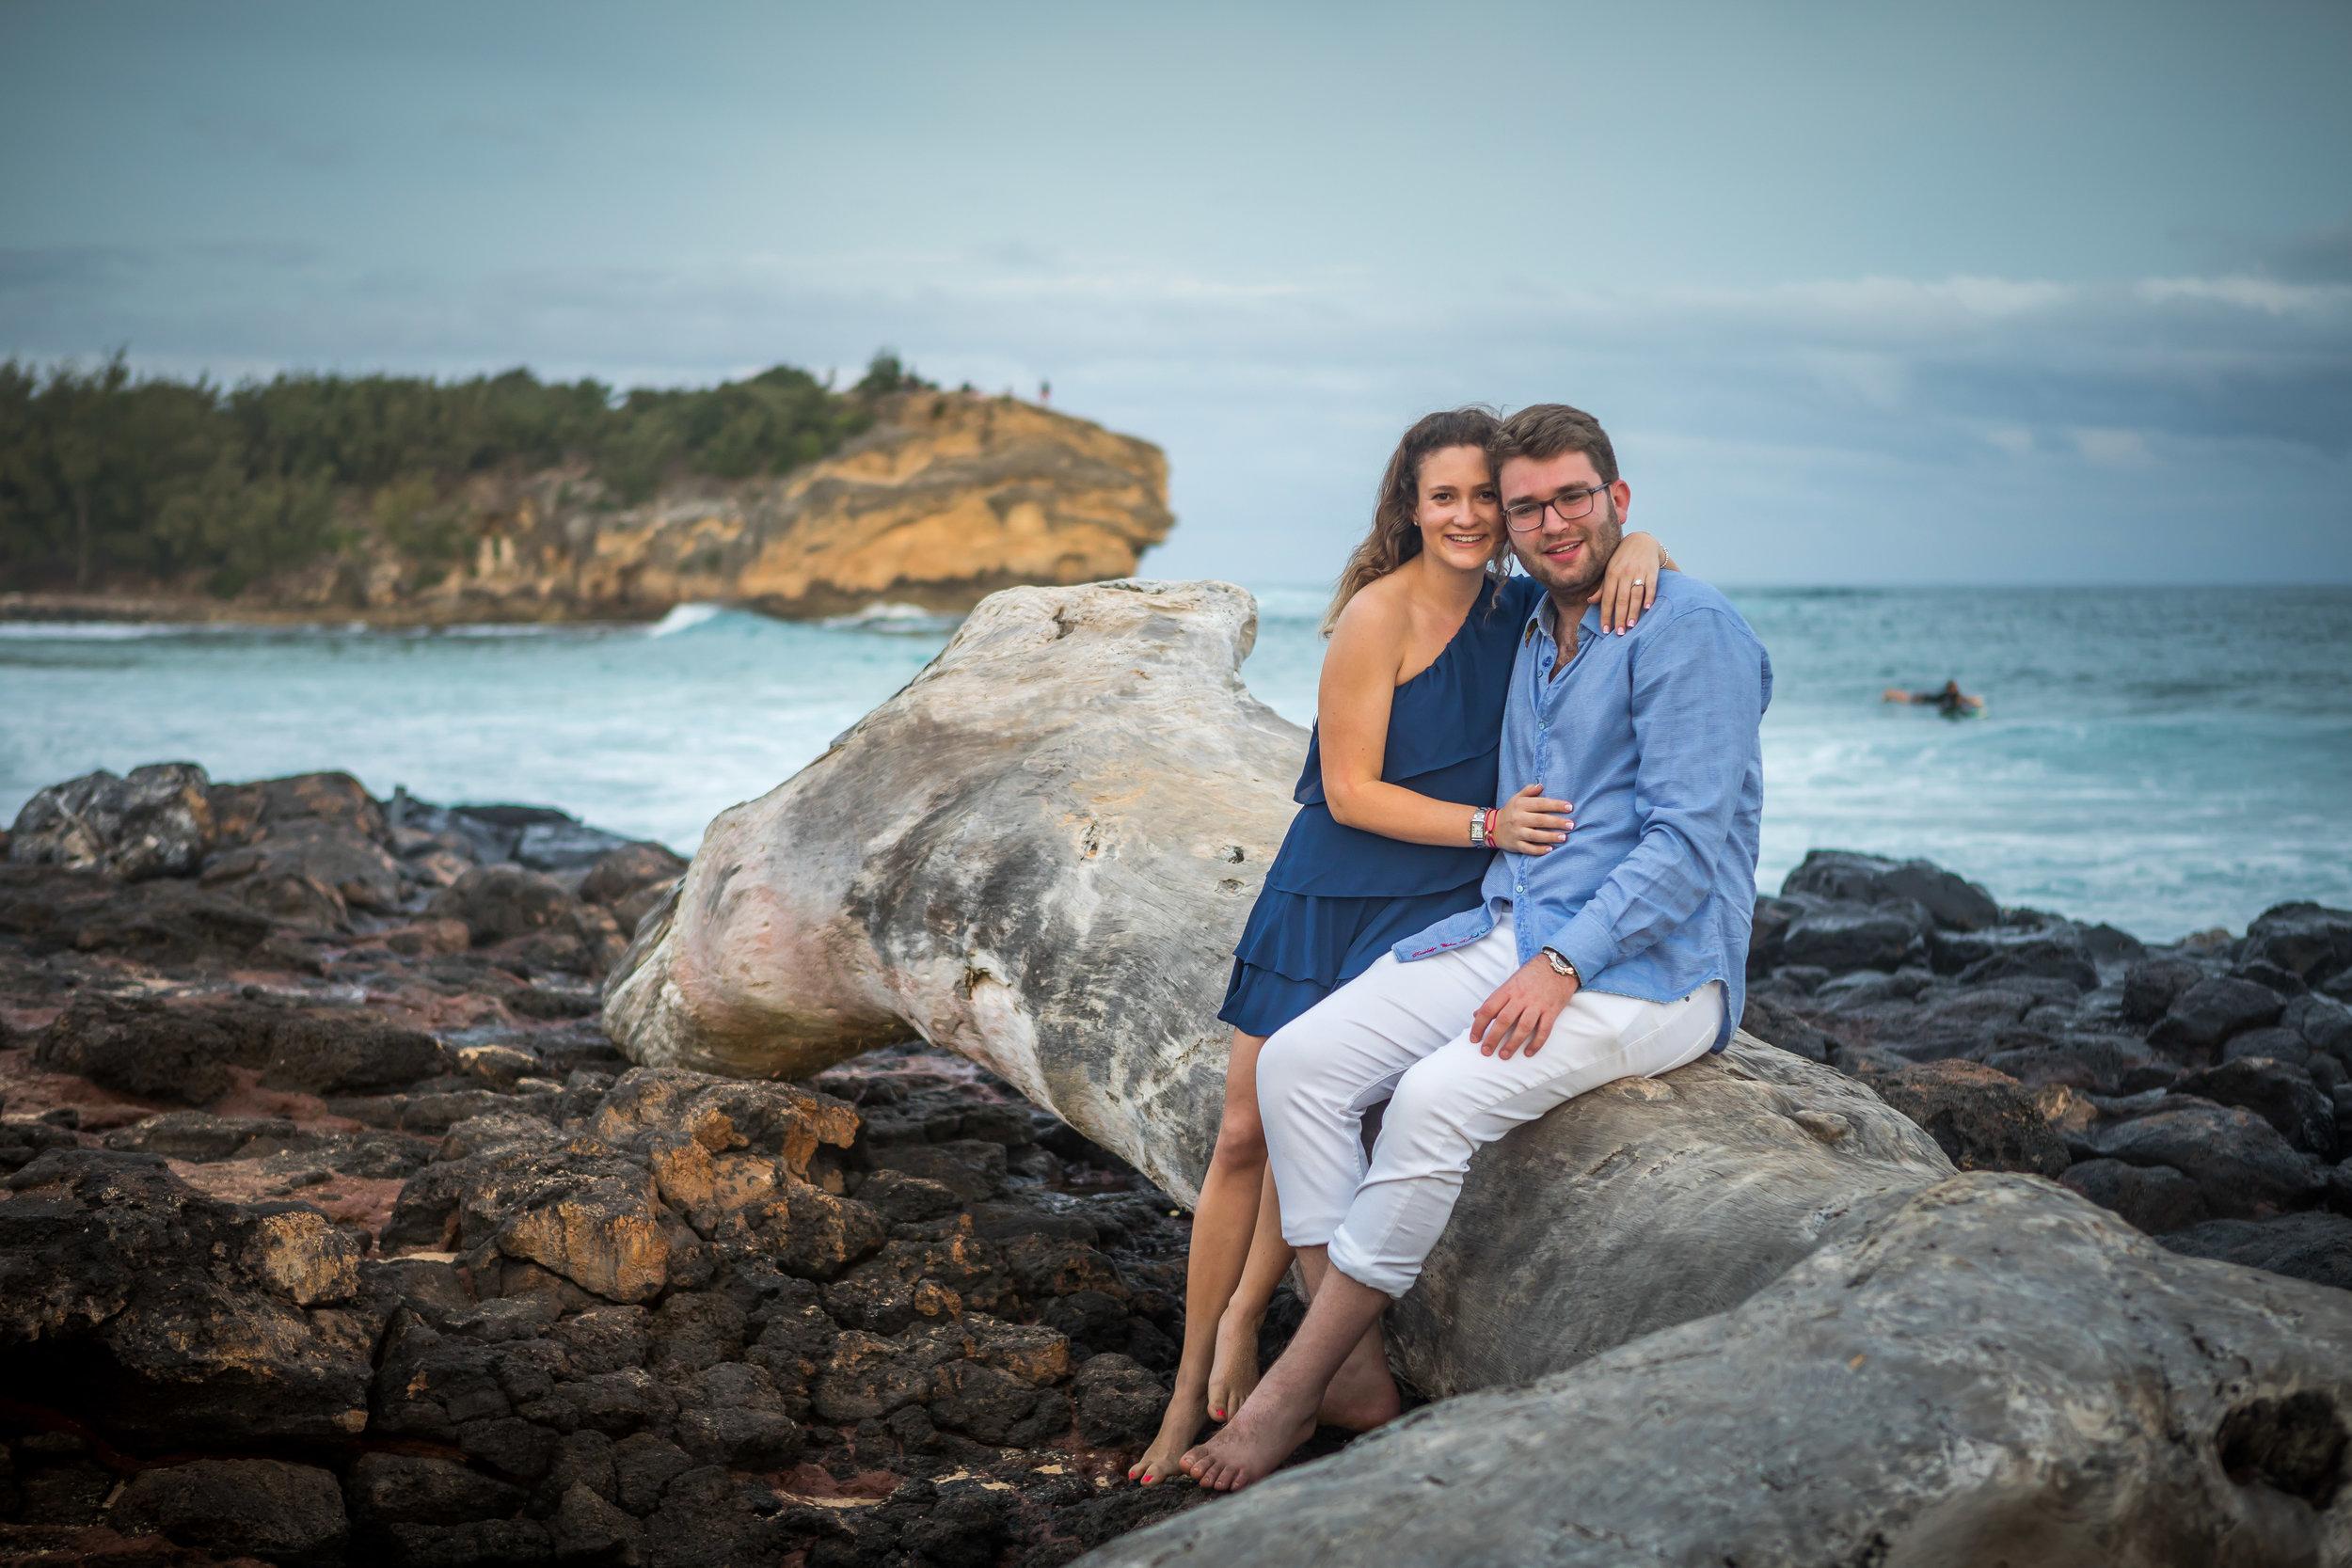 Kauai Surprise Engagement Photo 03